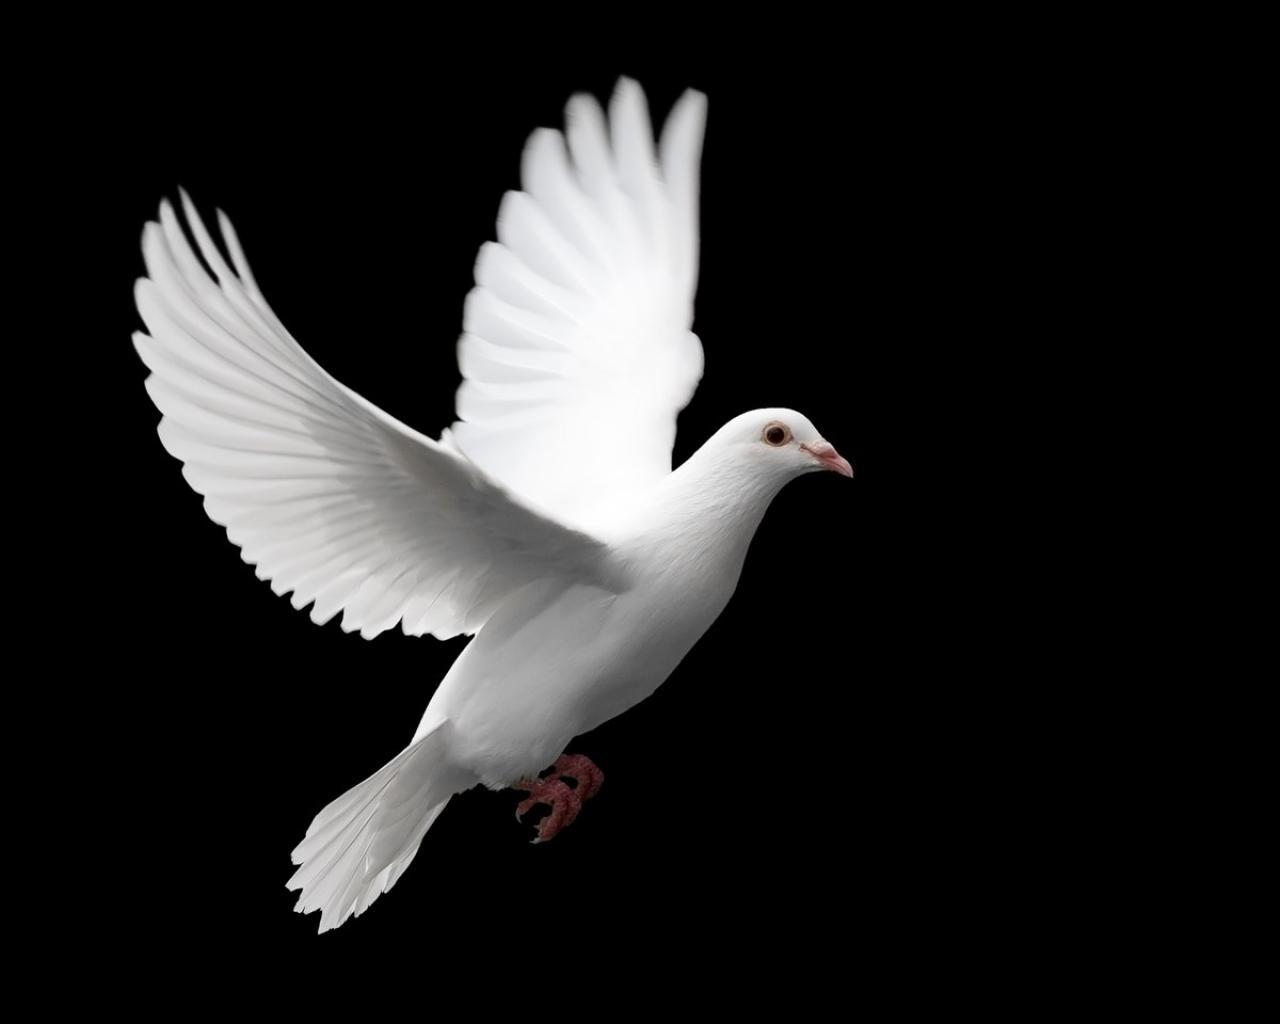 dove peace birds image hd wallpaper   14840   HQ Desktop Wallpapers 1280x1024